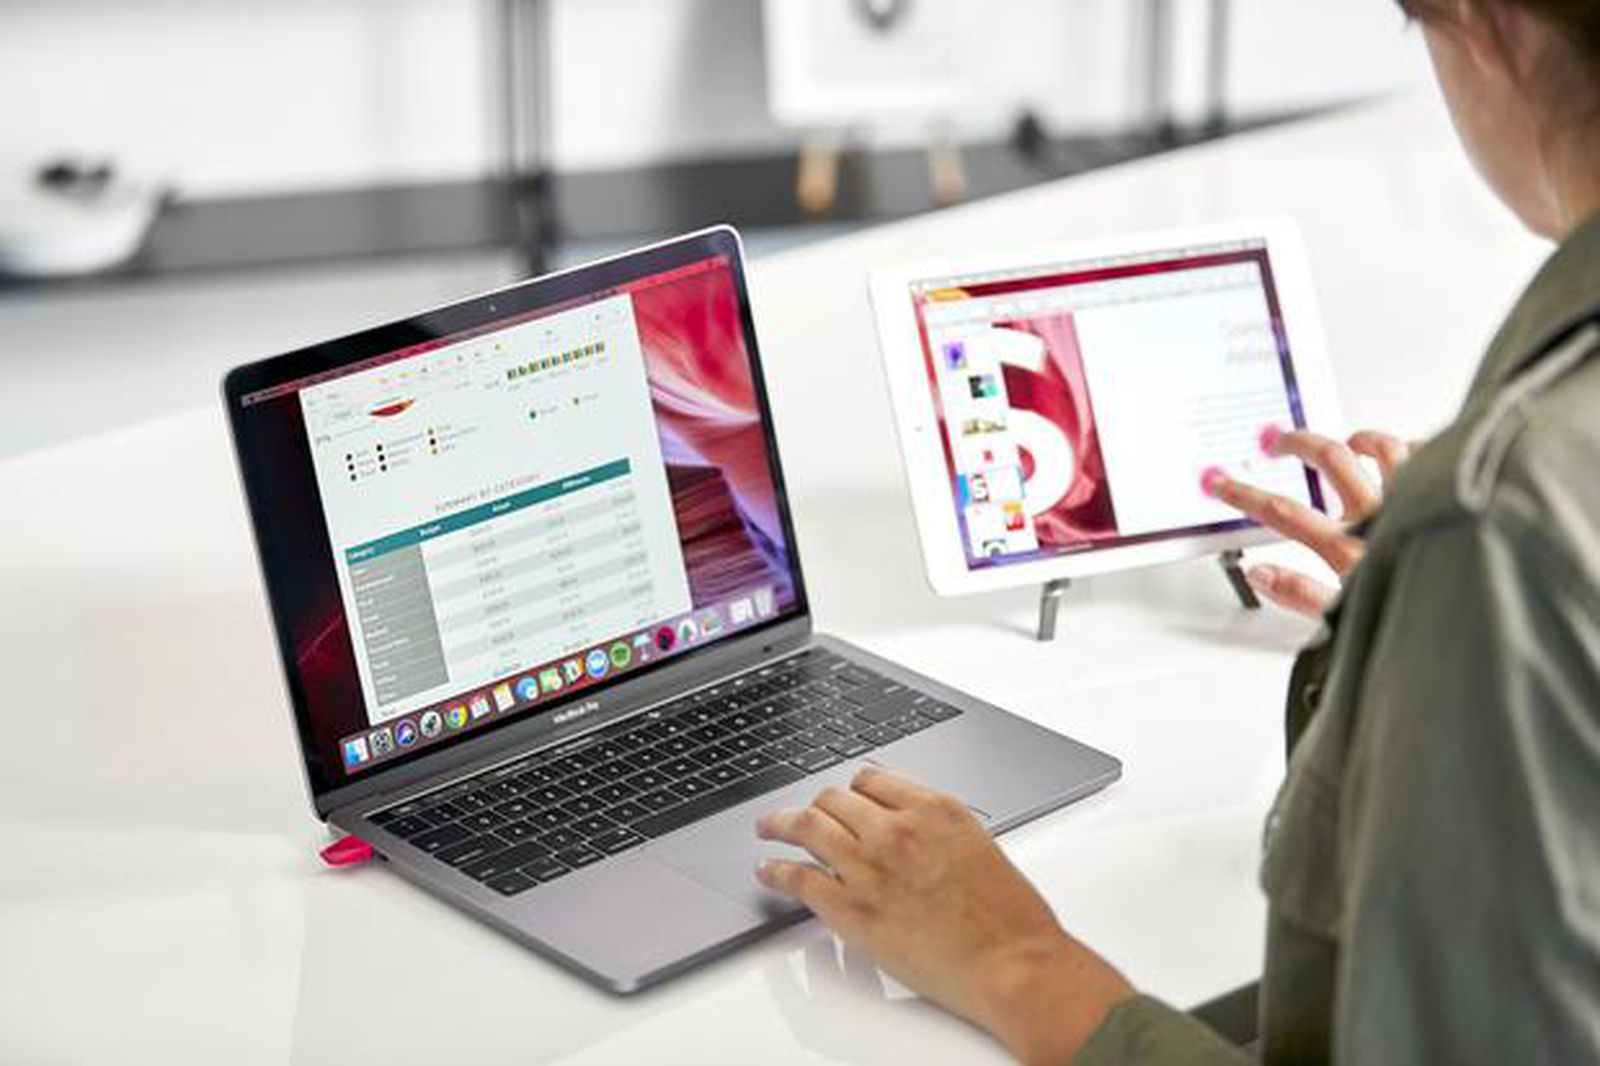 MacRumors Giveaway: Win a Luna Display Adapter to Turn an iPad or Mac Into a Second Screen